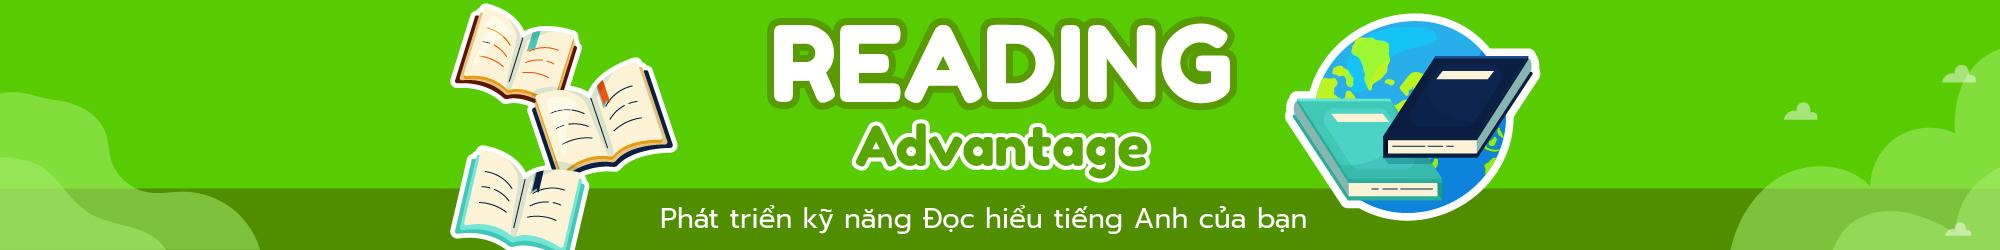 READING ADVANTAGE 2